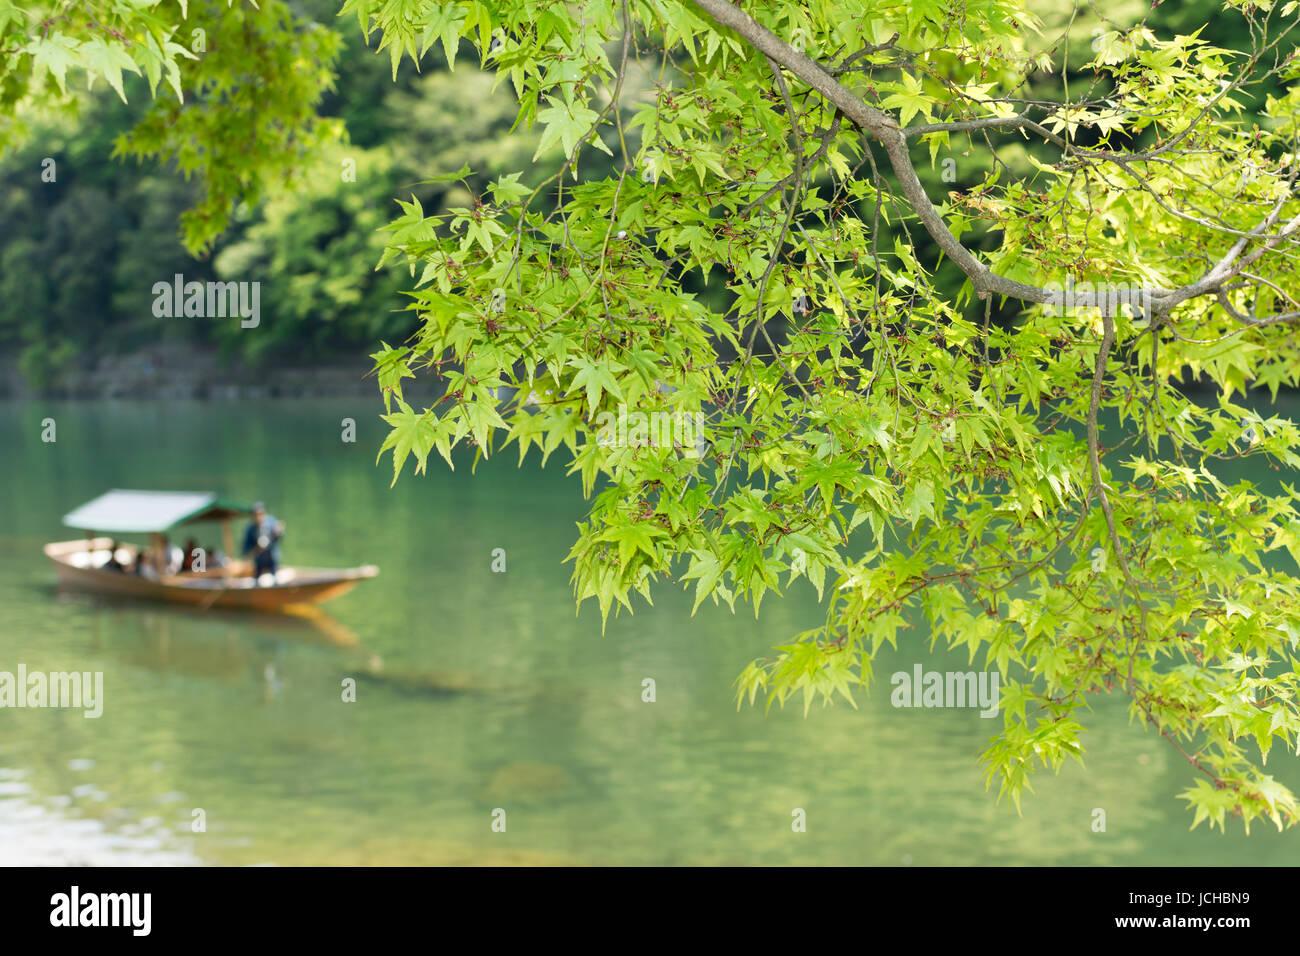 YOTO, JAPAN - APRIL 26th  : Closeup tender green maple leaves in the shore of Hozu(Katsuragawa) River  in Arashiyama - Stock Image